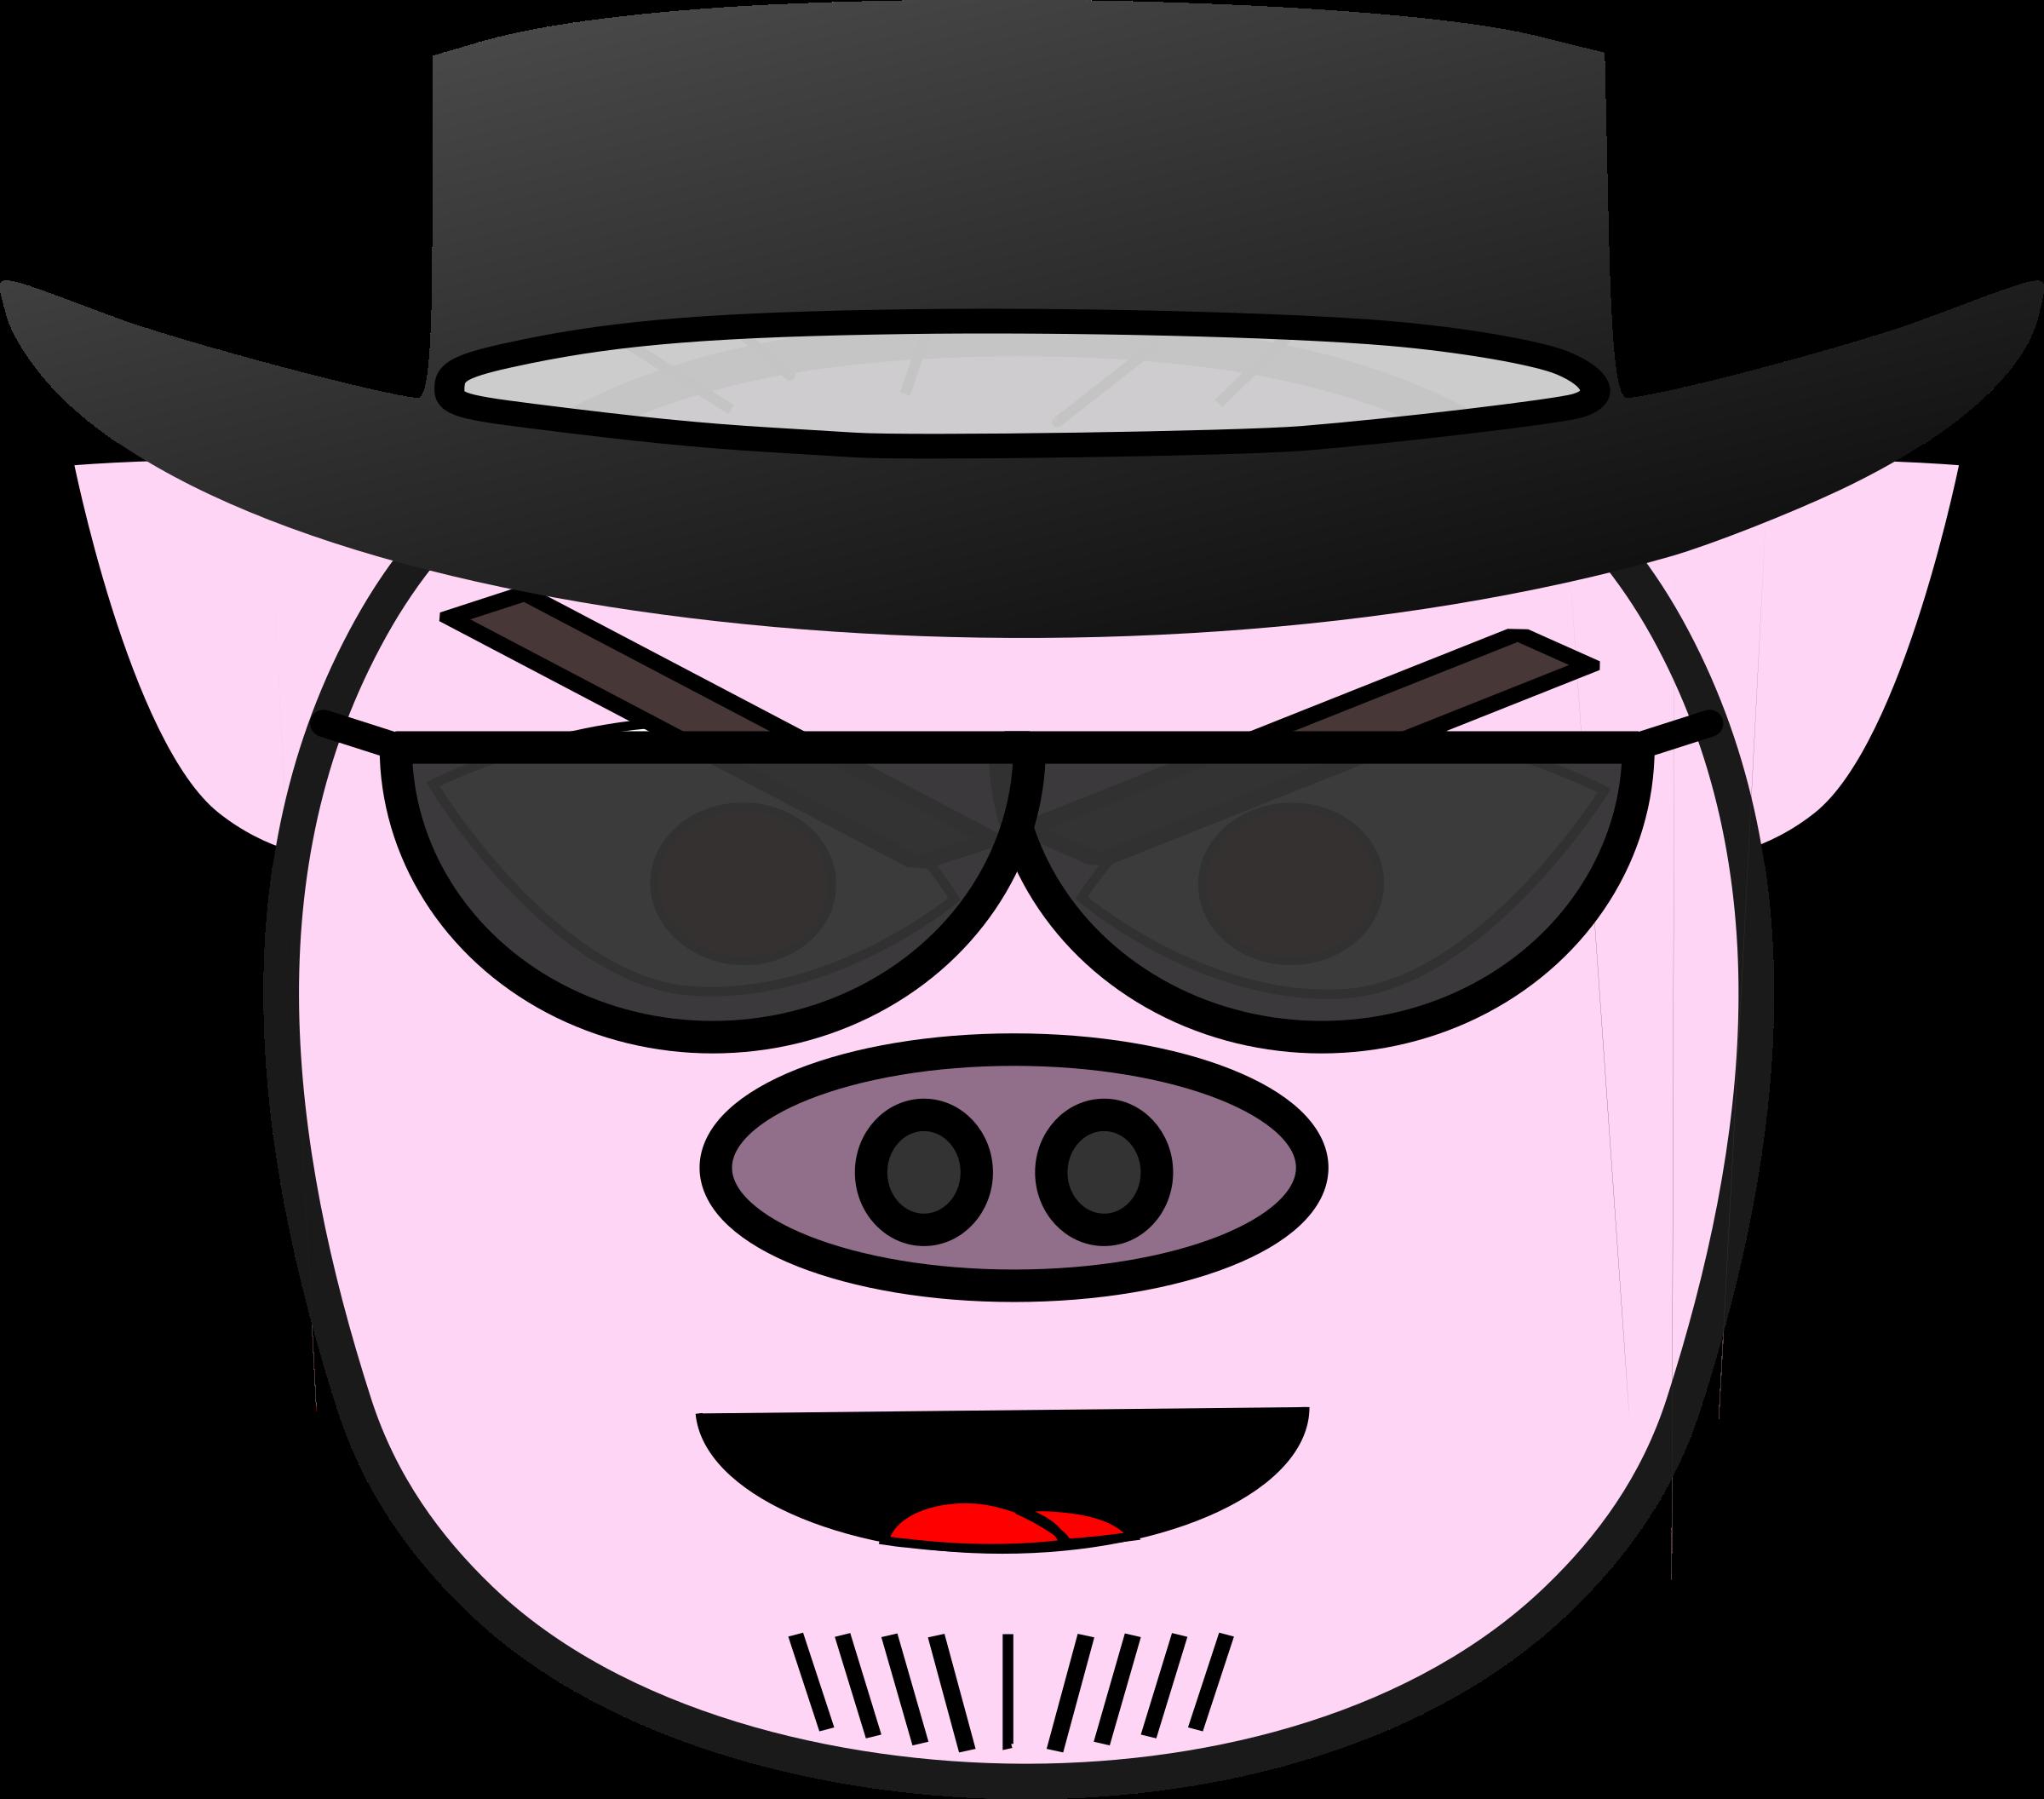 Evil big image png. Mouth clipart pig